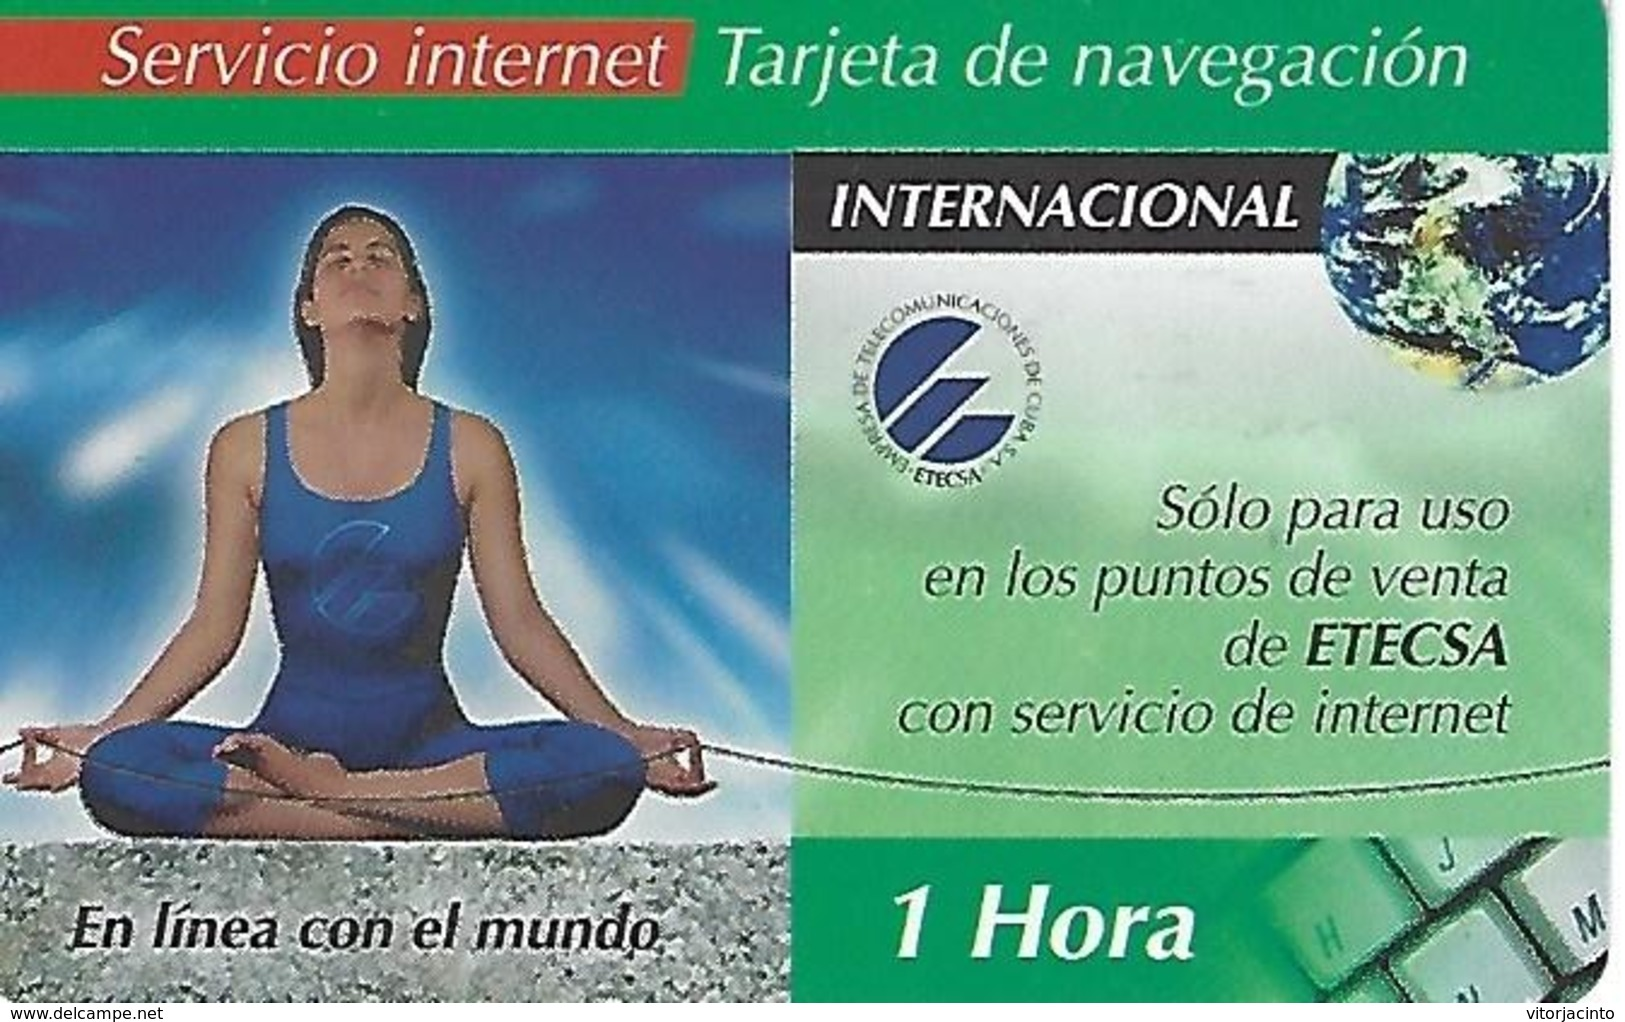 Etecsa Internet  Service - 1 Hour - Cuba - Cuba